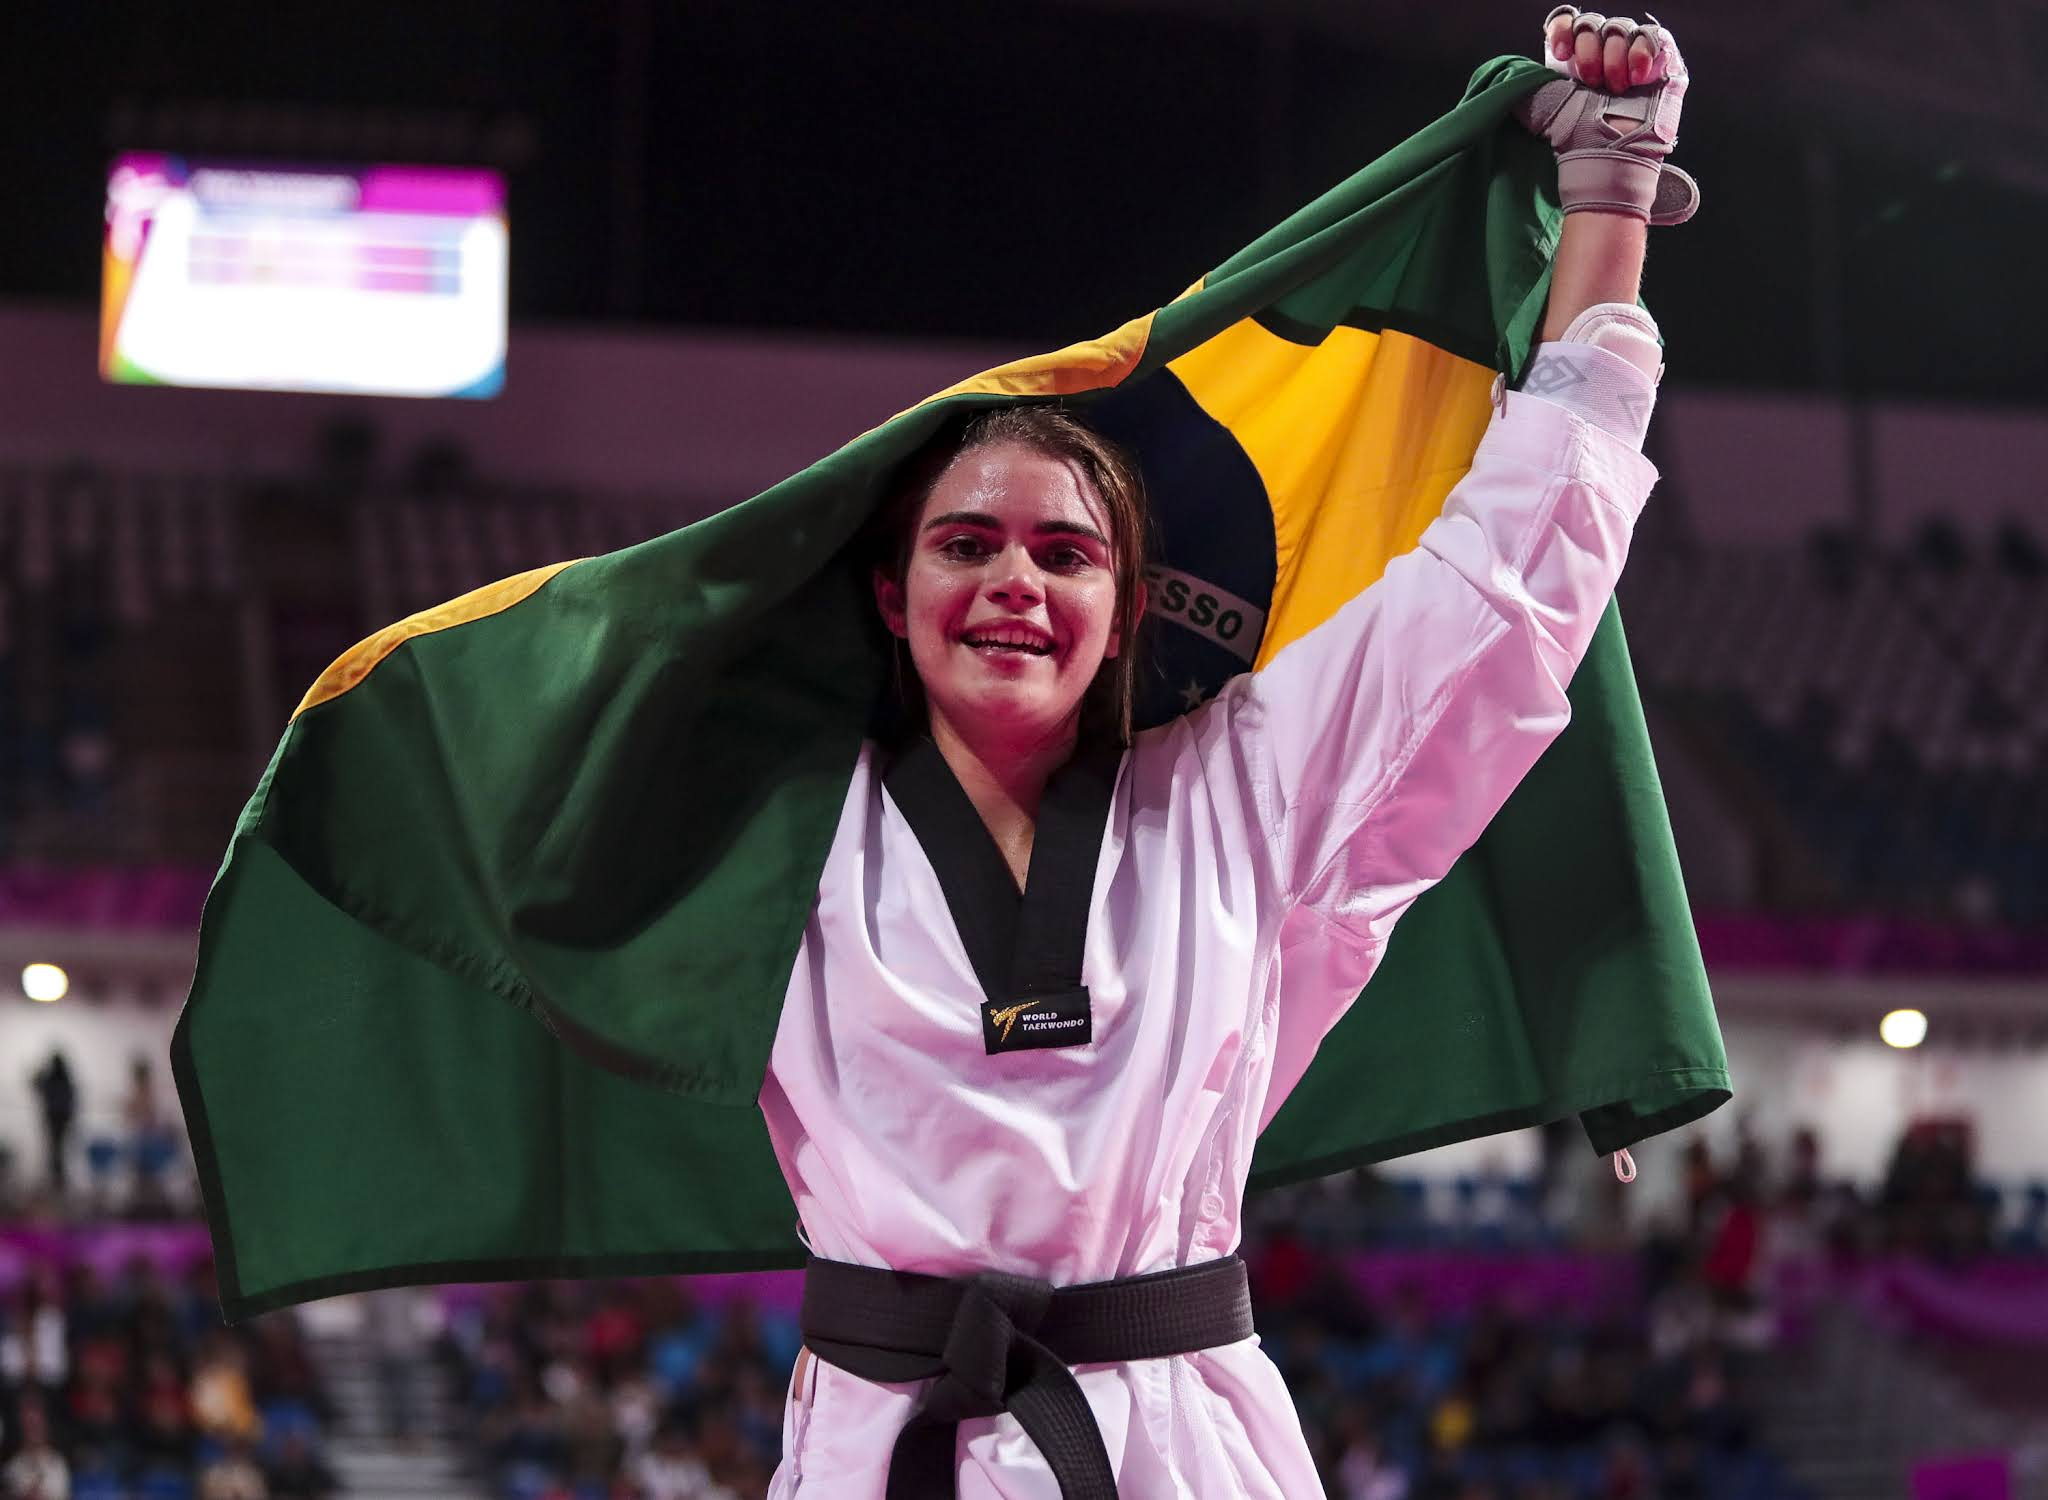 Brasileiros no parataekwondo nas Paralimpíadas de Tóquio